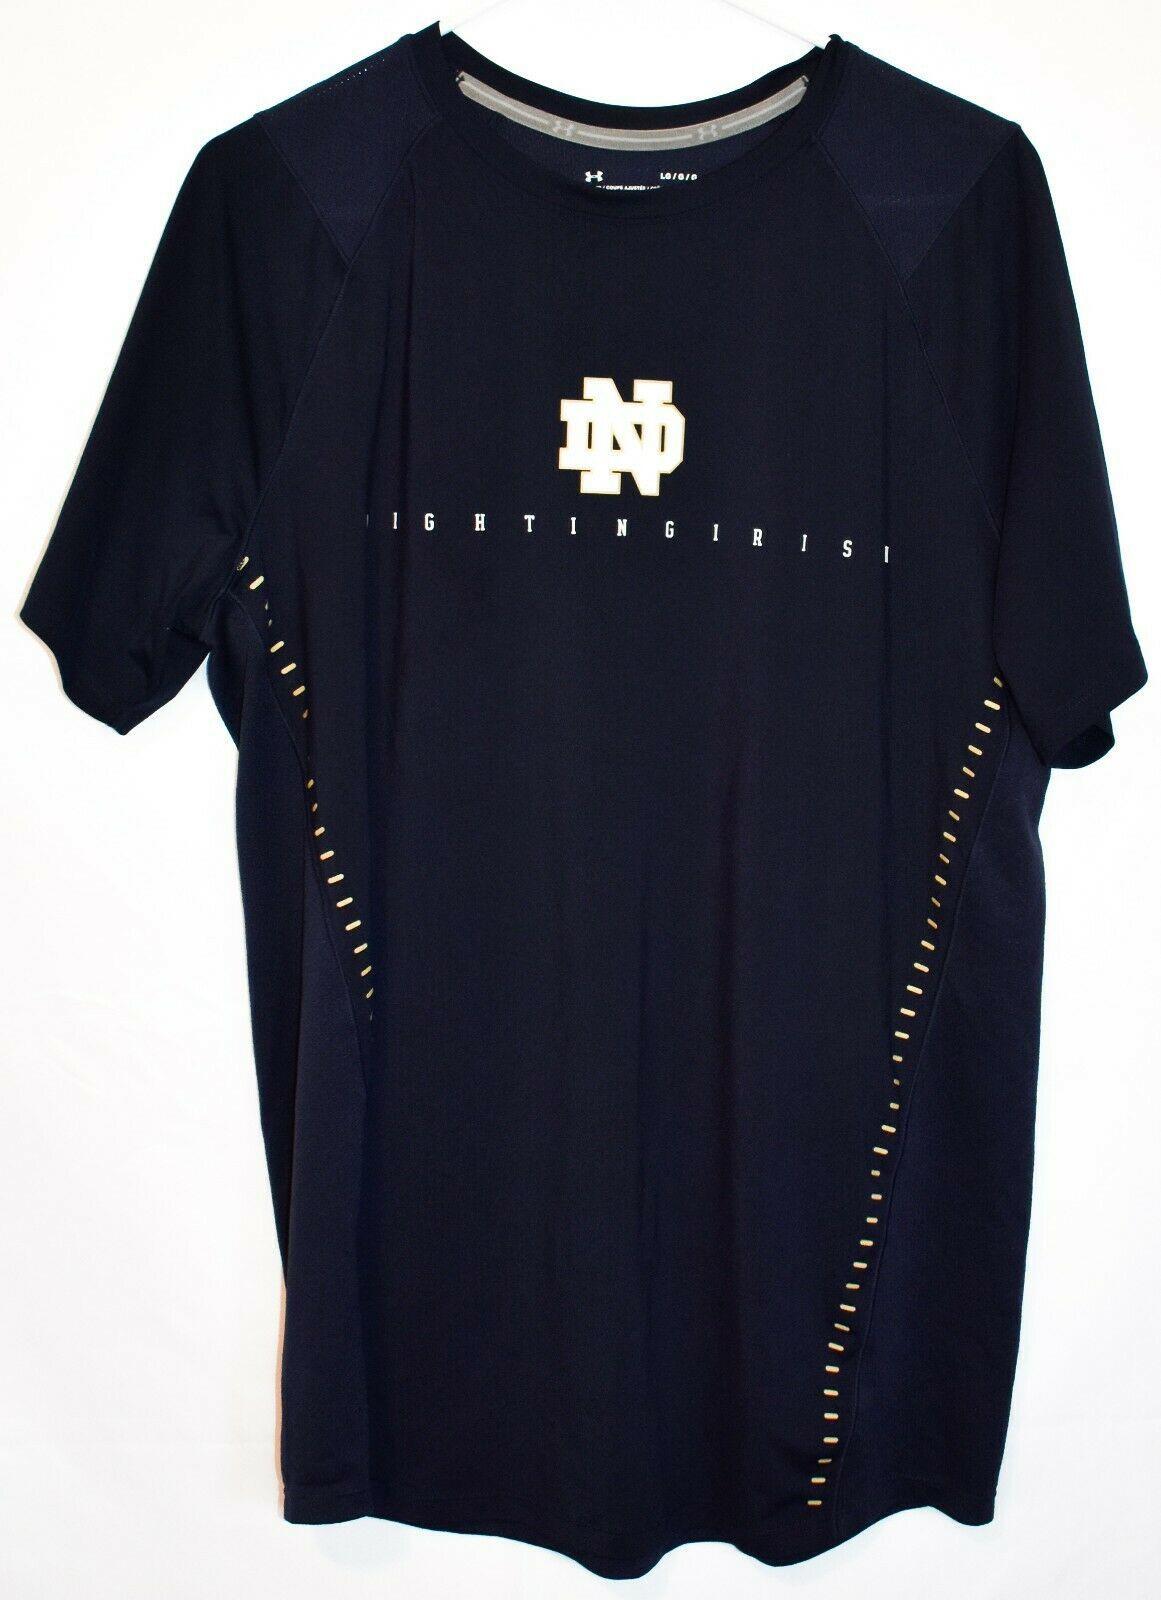 Under Armour Fitted HeatGear Notre Dame Fighting Irish Men's Navy Shirt Size LG